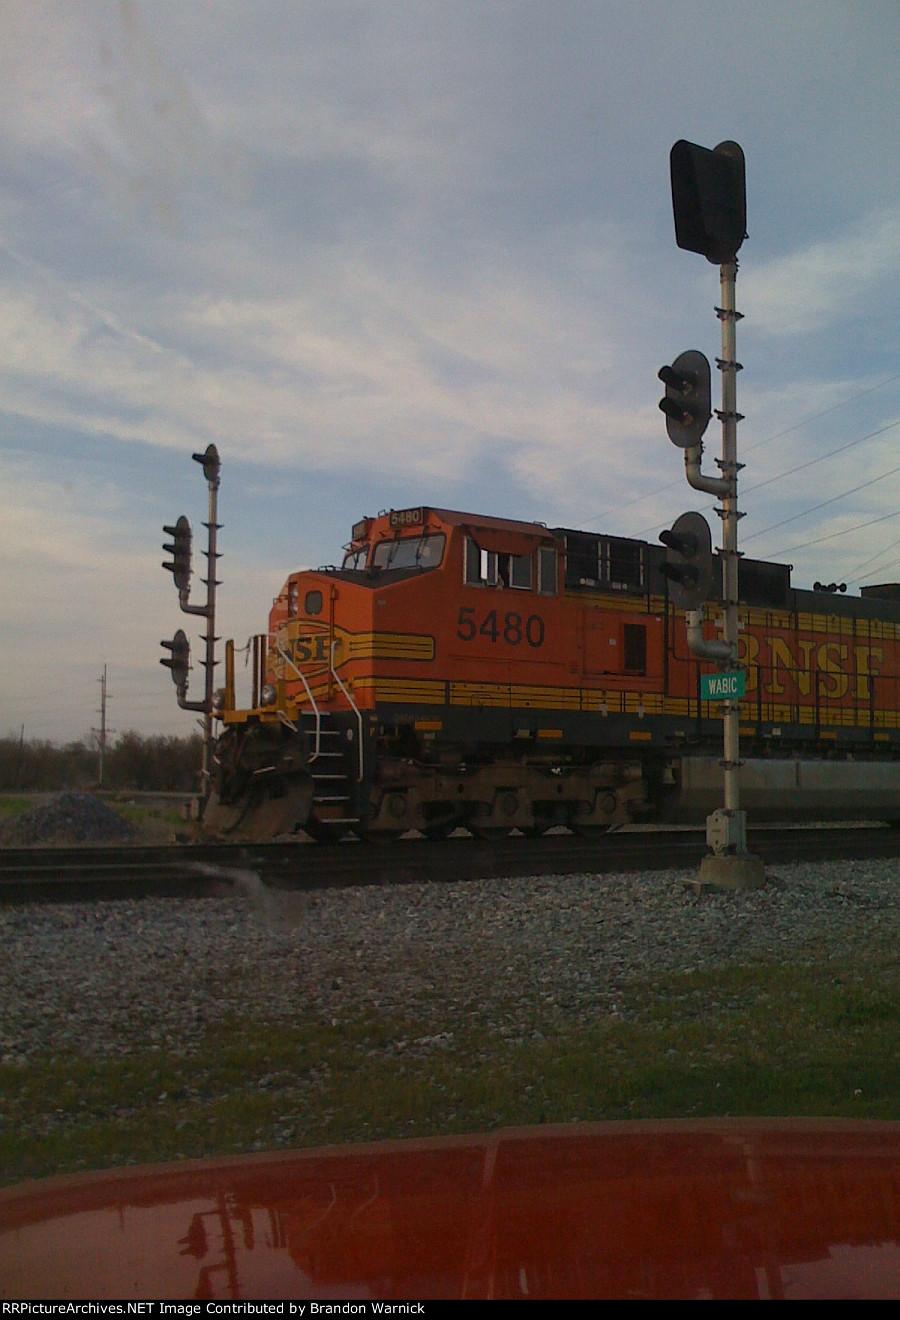 BNSF #5480